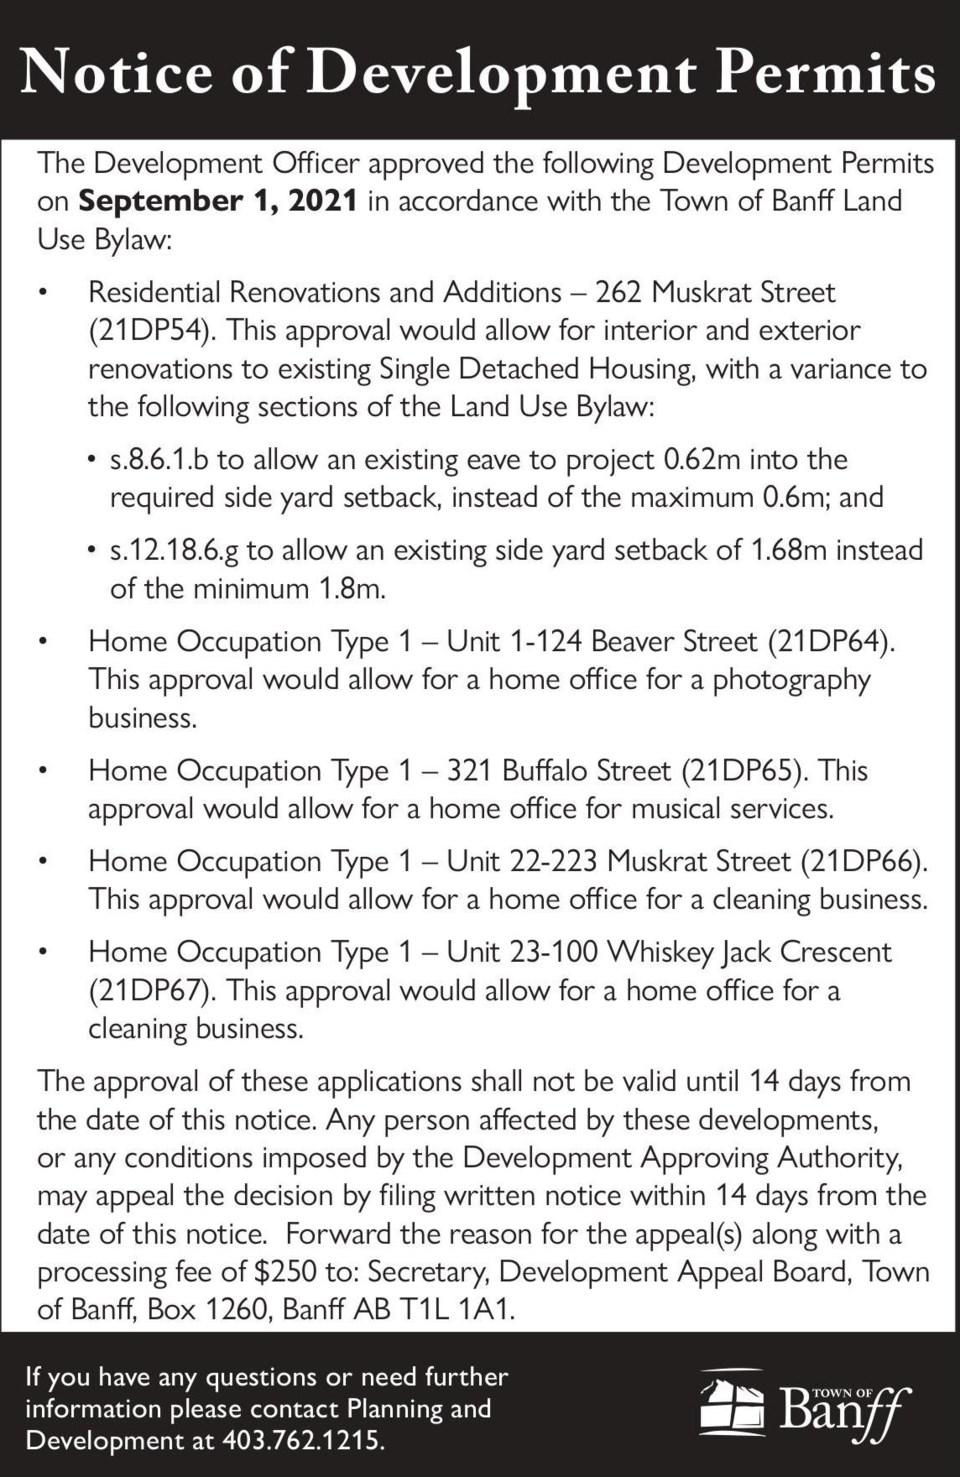 PUBLIC NOTICE – Town of Banff – development permits – Sept. 9, 2021